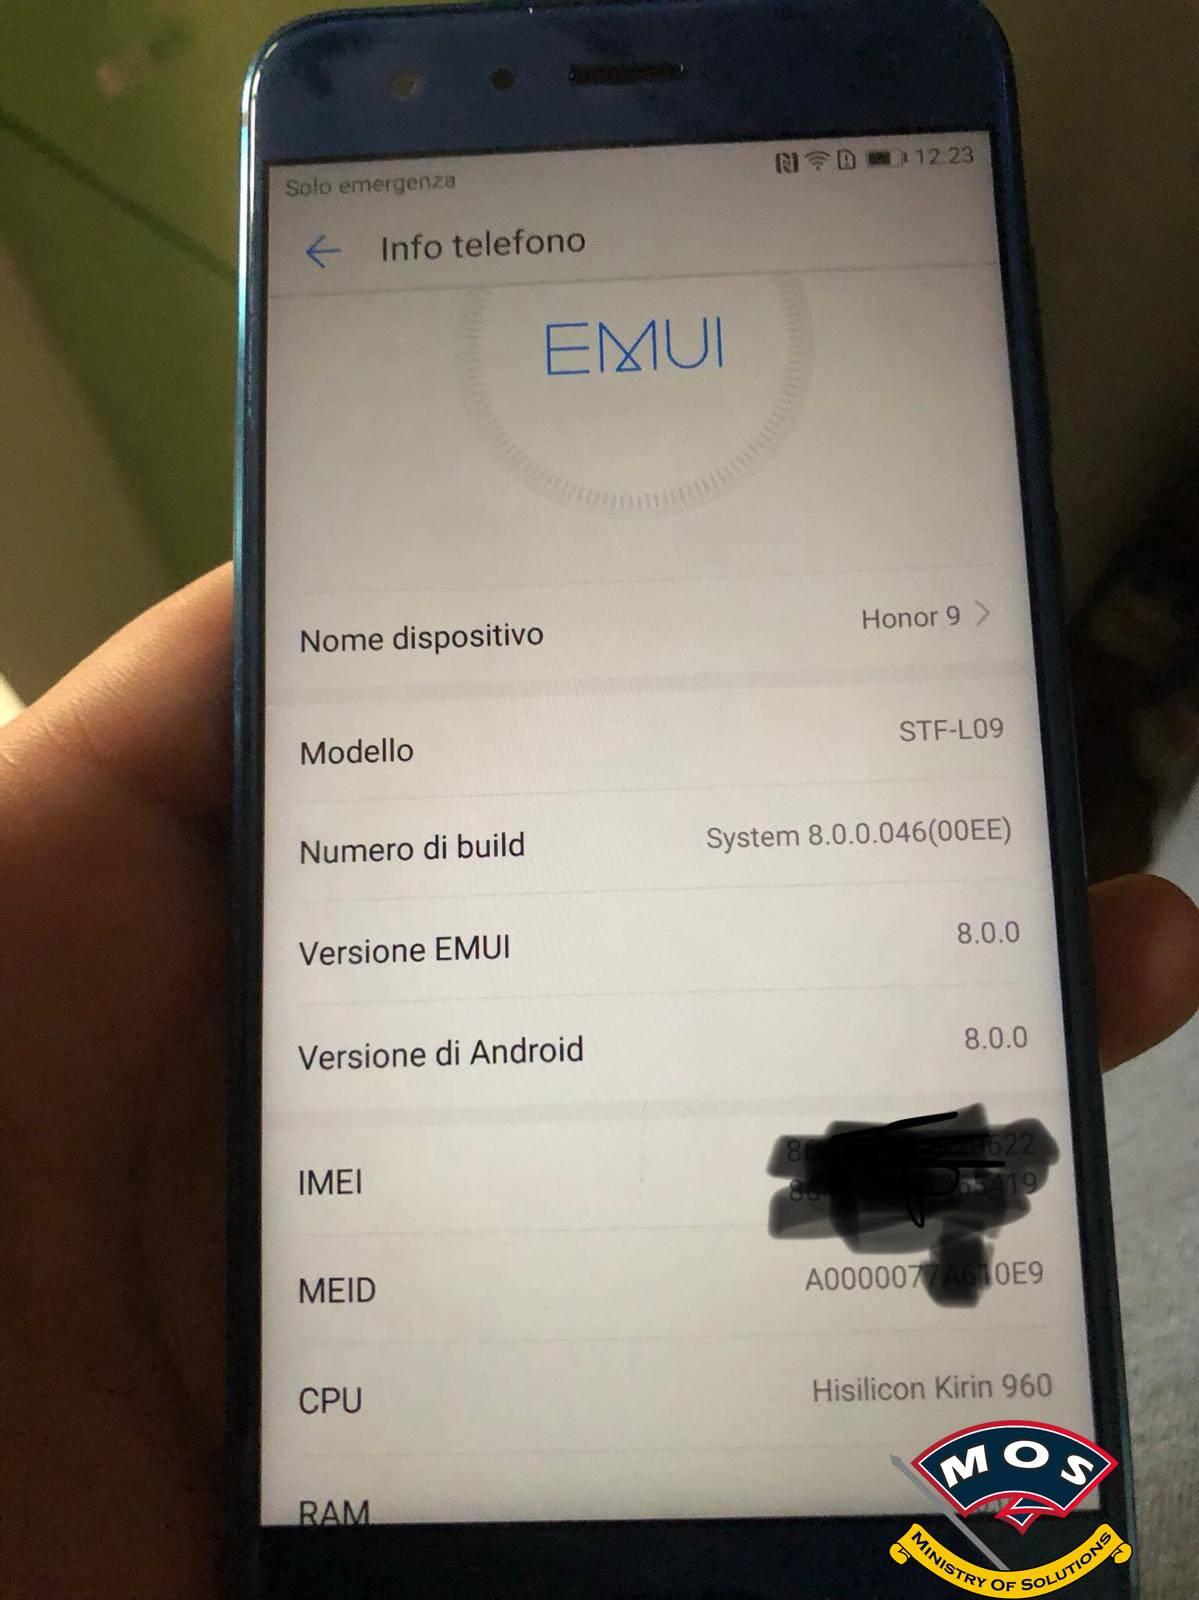 Huawei Honor 9 Chinese Model Convert to European (Paid